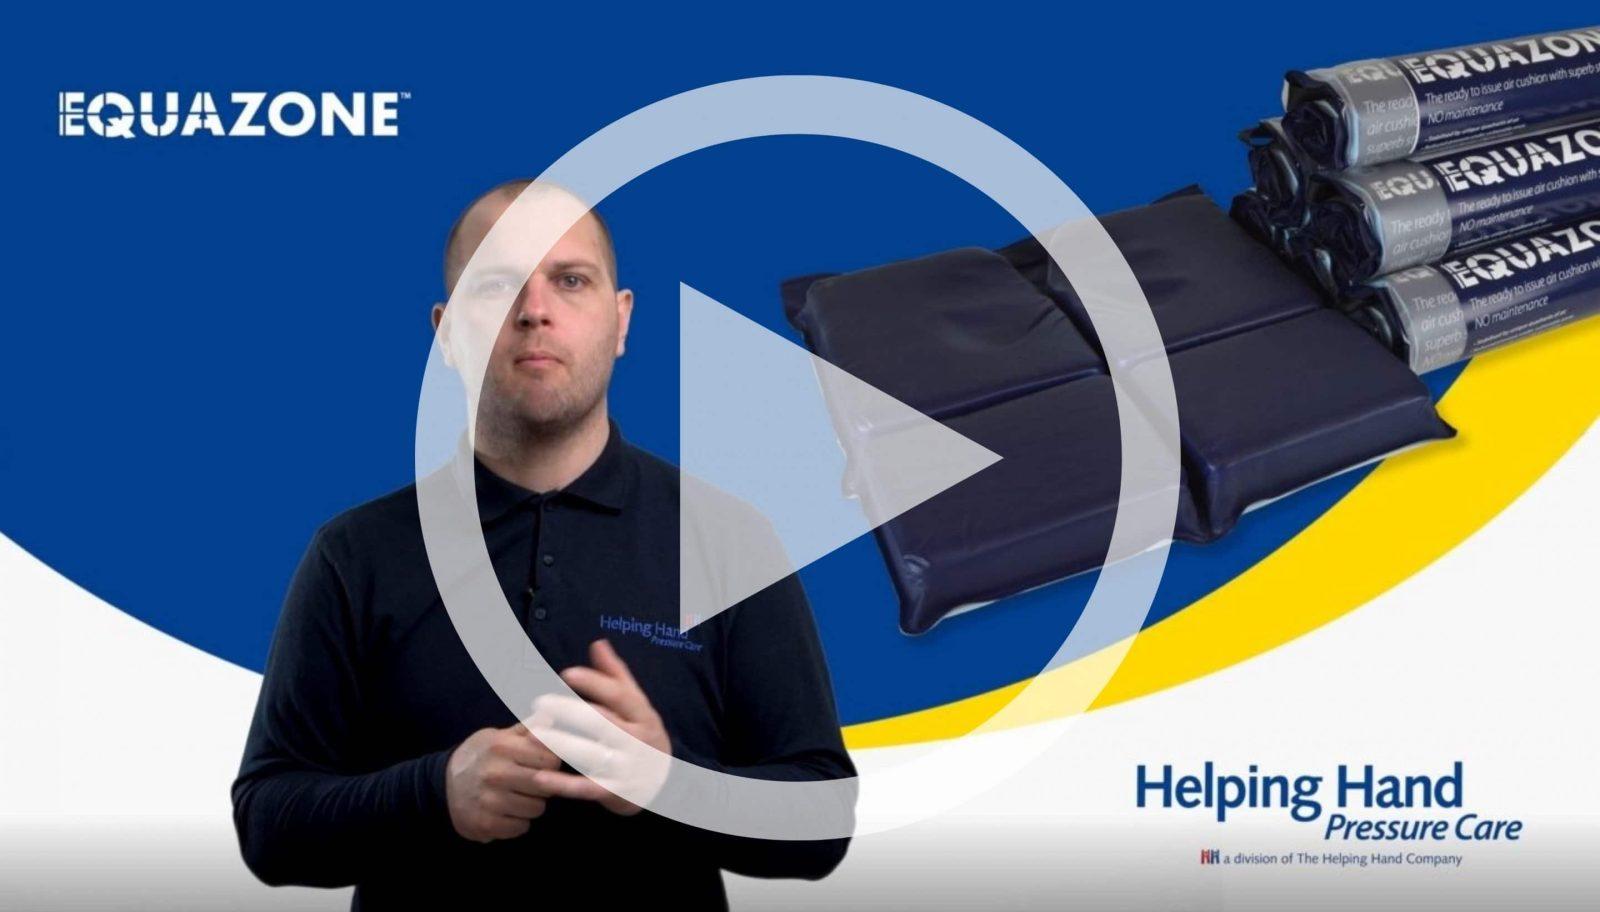 Equazone high risk pressure cushion link